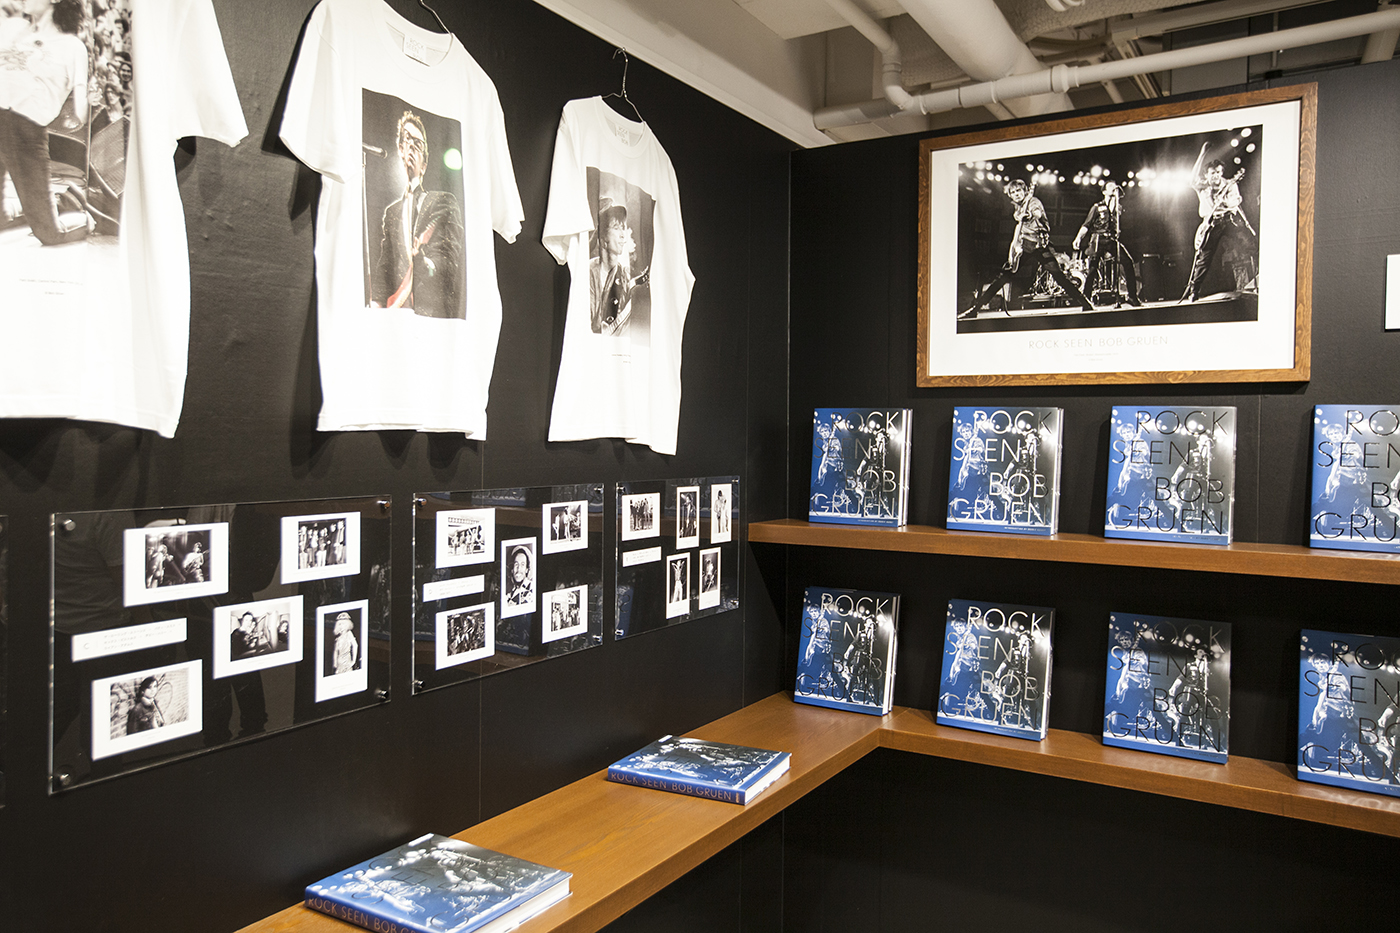 m-0122 【レポート】ロックの歴史が凝縮。フジロックファンも必見のボブ・グルーエン写真展